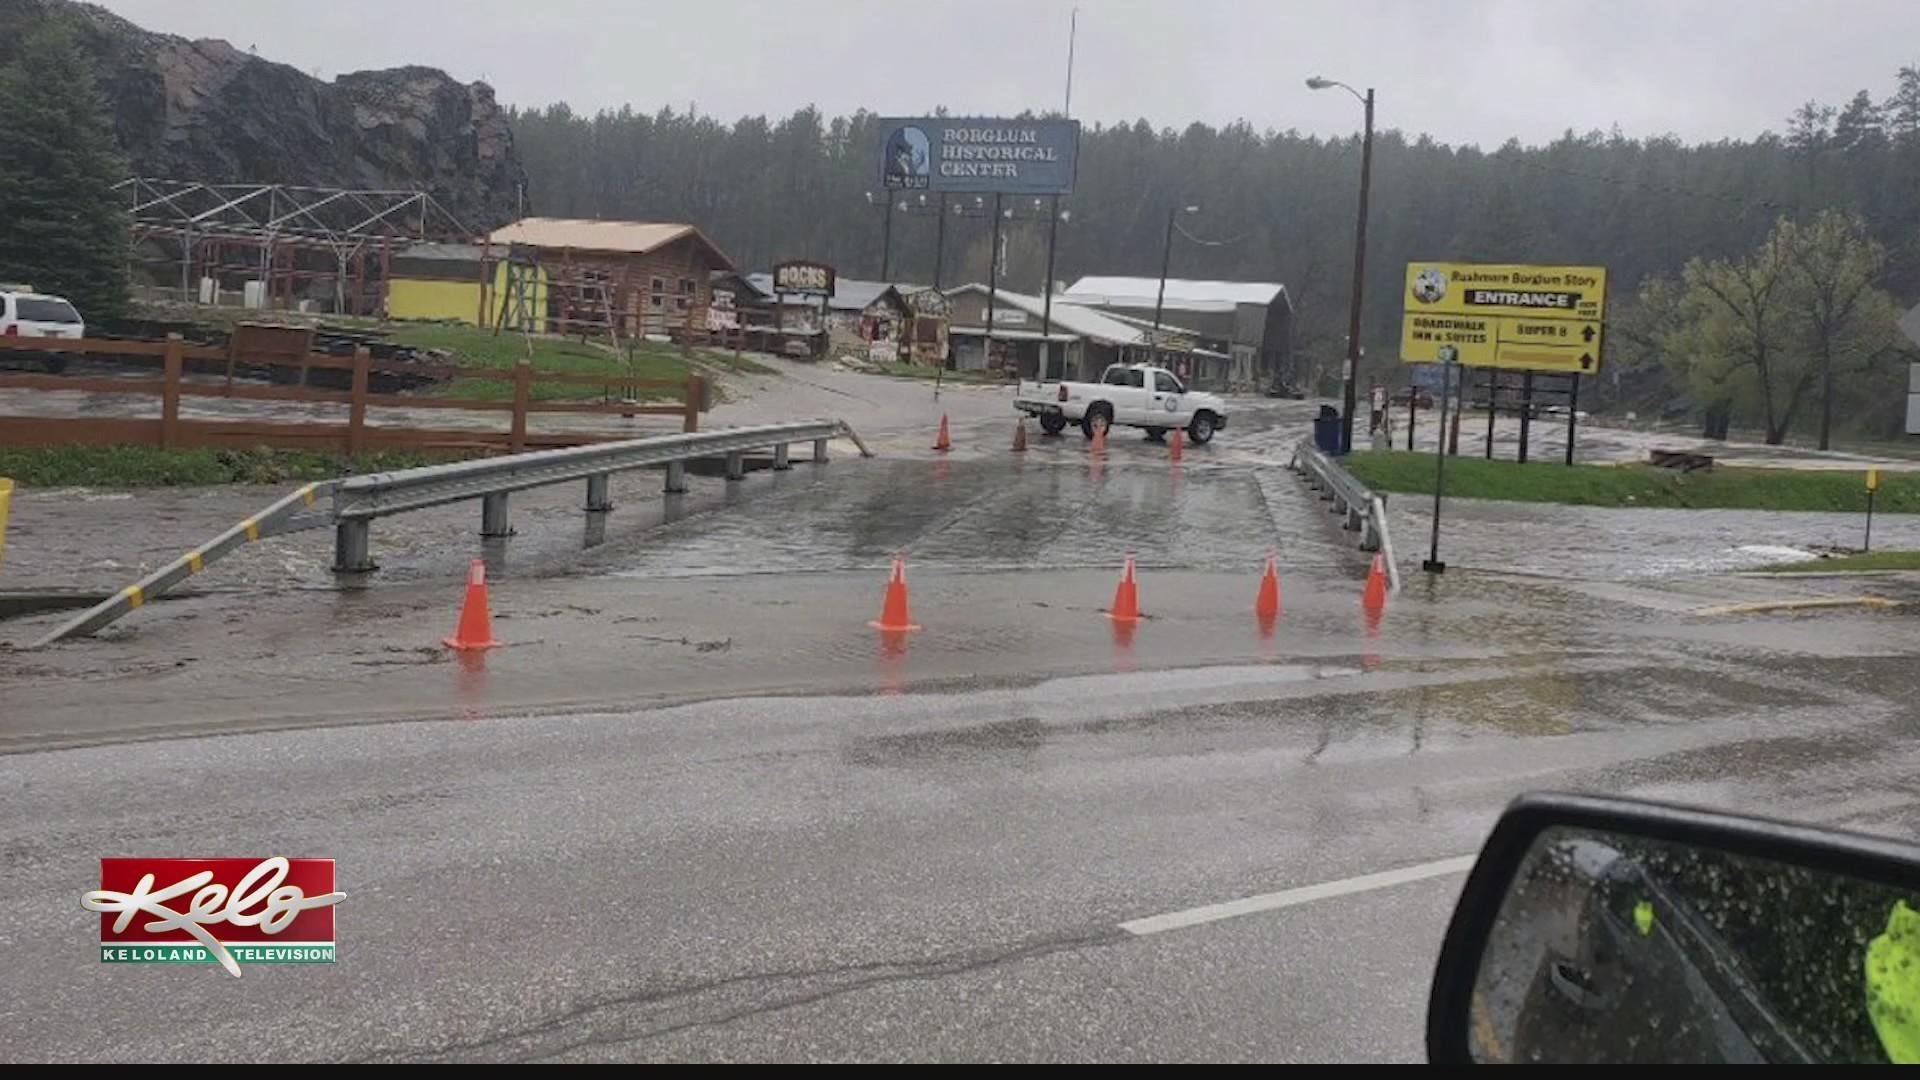 Dangerous driving conditions in Black Hills